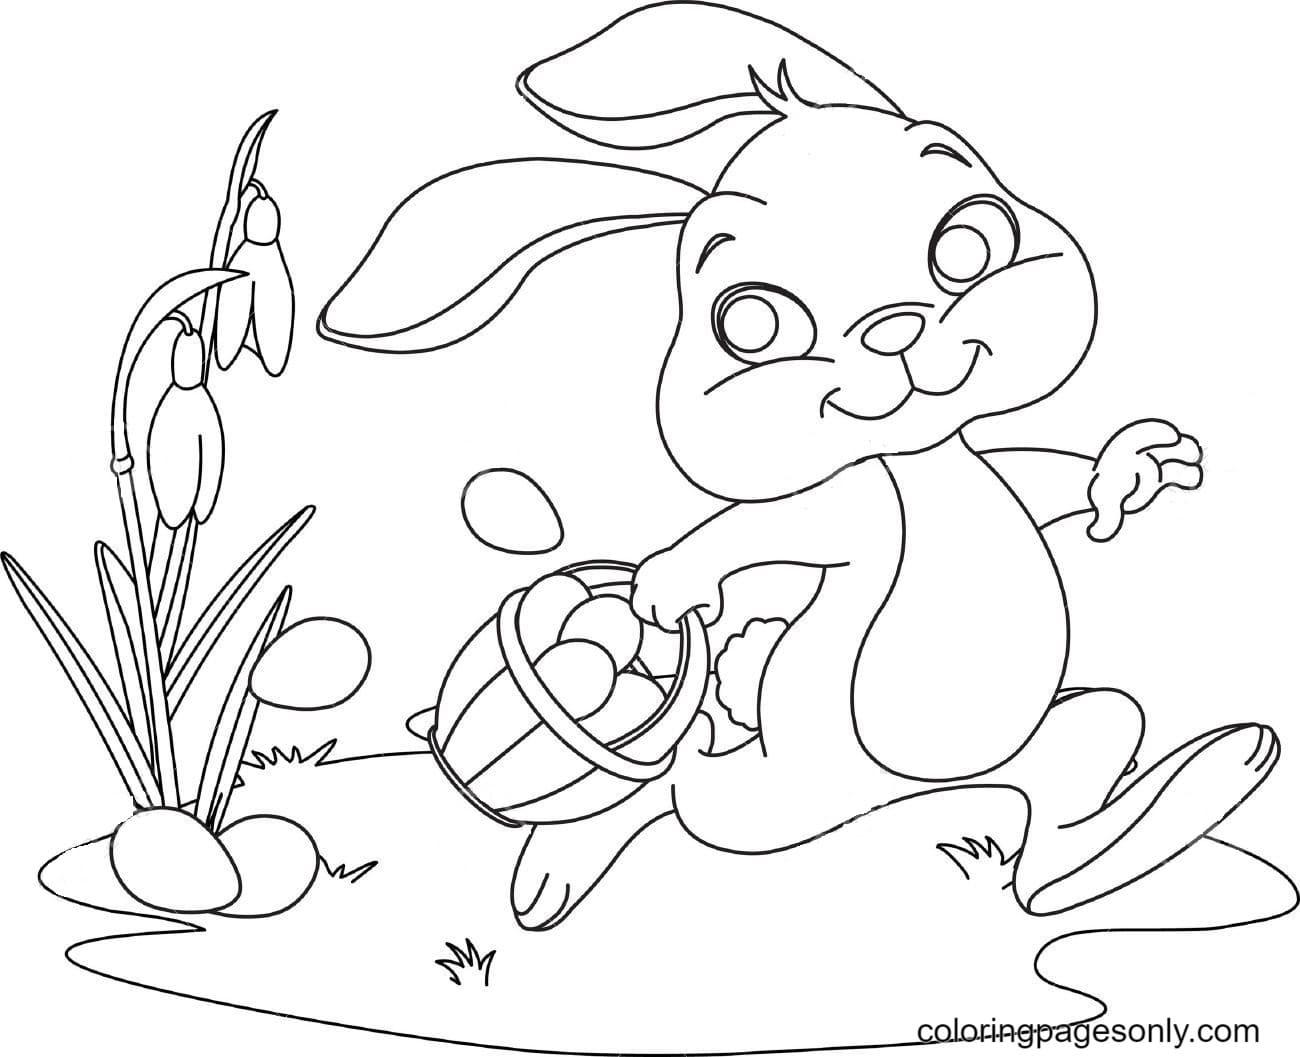 Fun Cute Bunnies Coloring Page